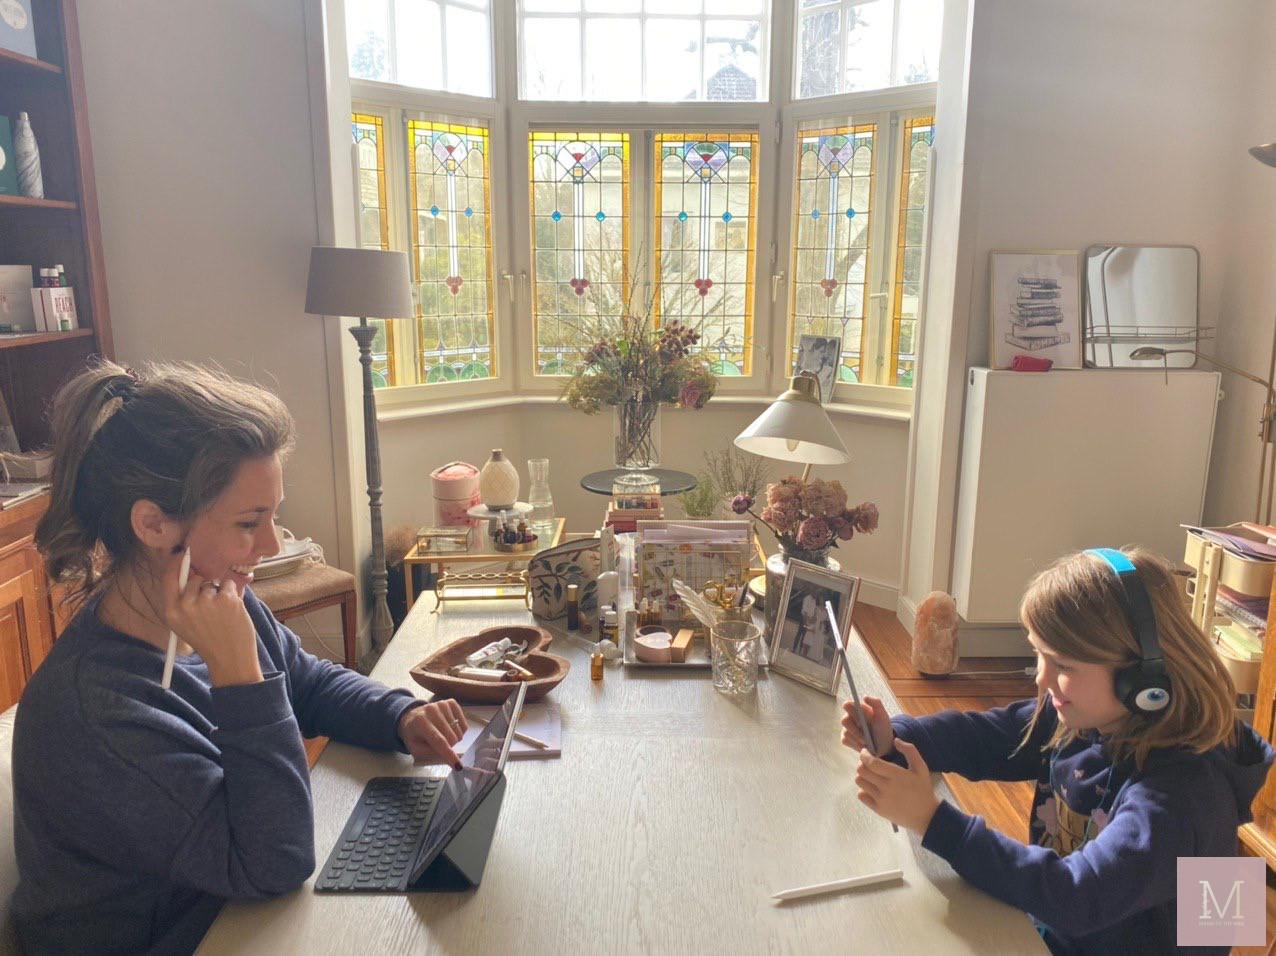 thuis werken kinderen thuis squla ervaringen